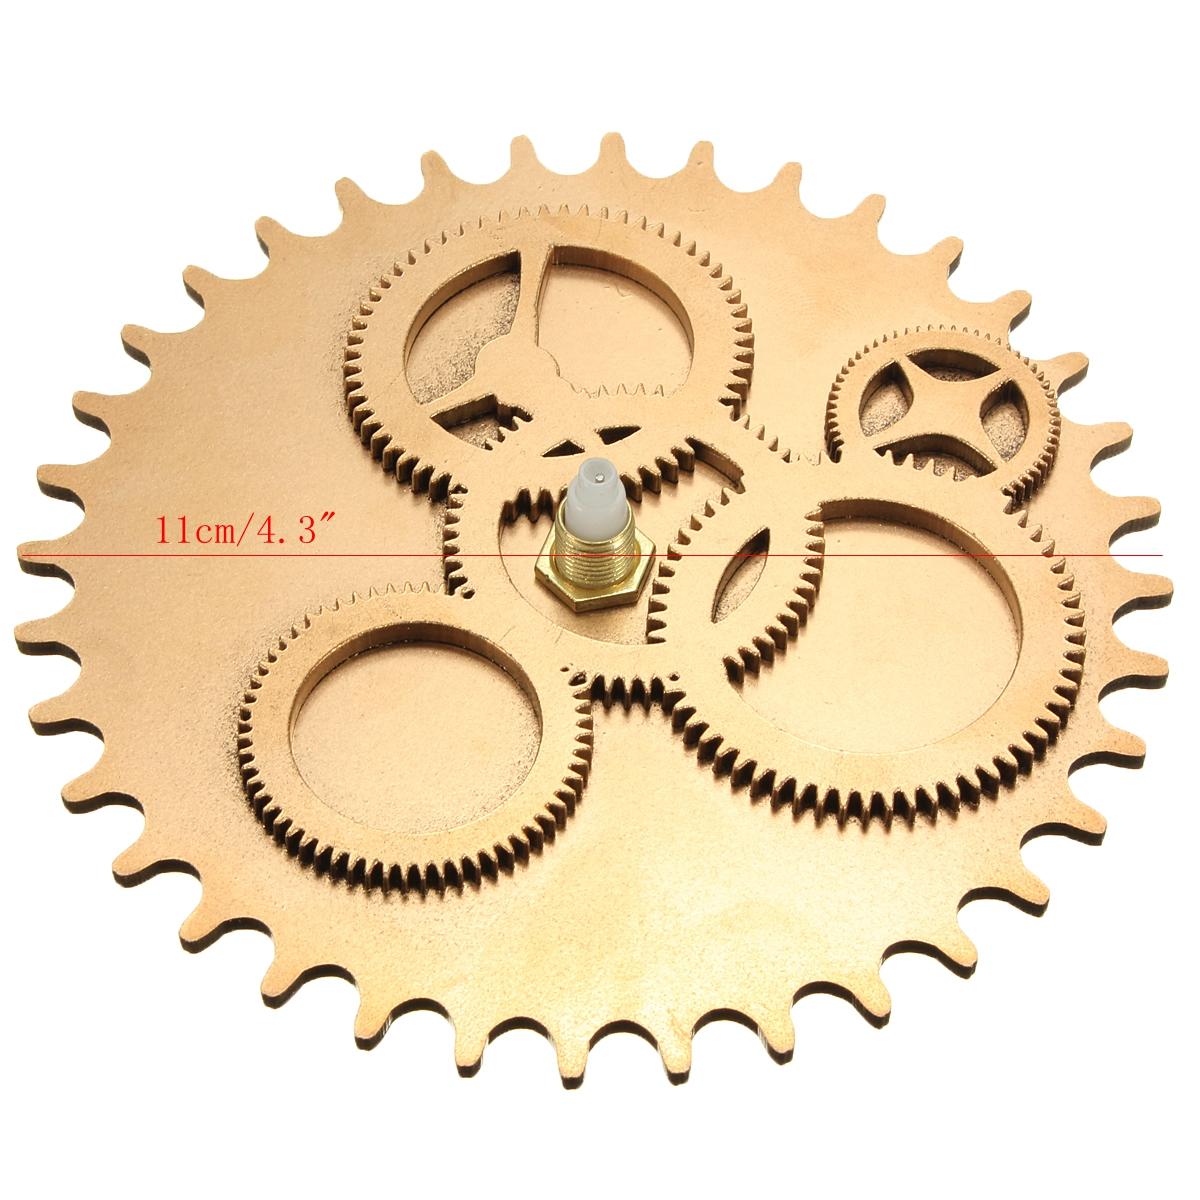 Gold 3D Vintage DIY Mechanism Retro Gear Large Hand Wall Clock ...